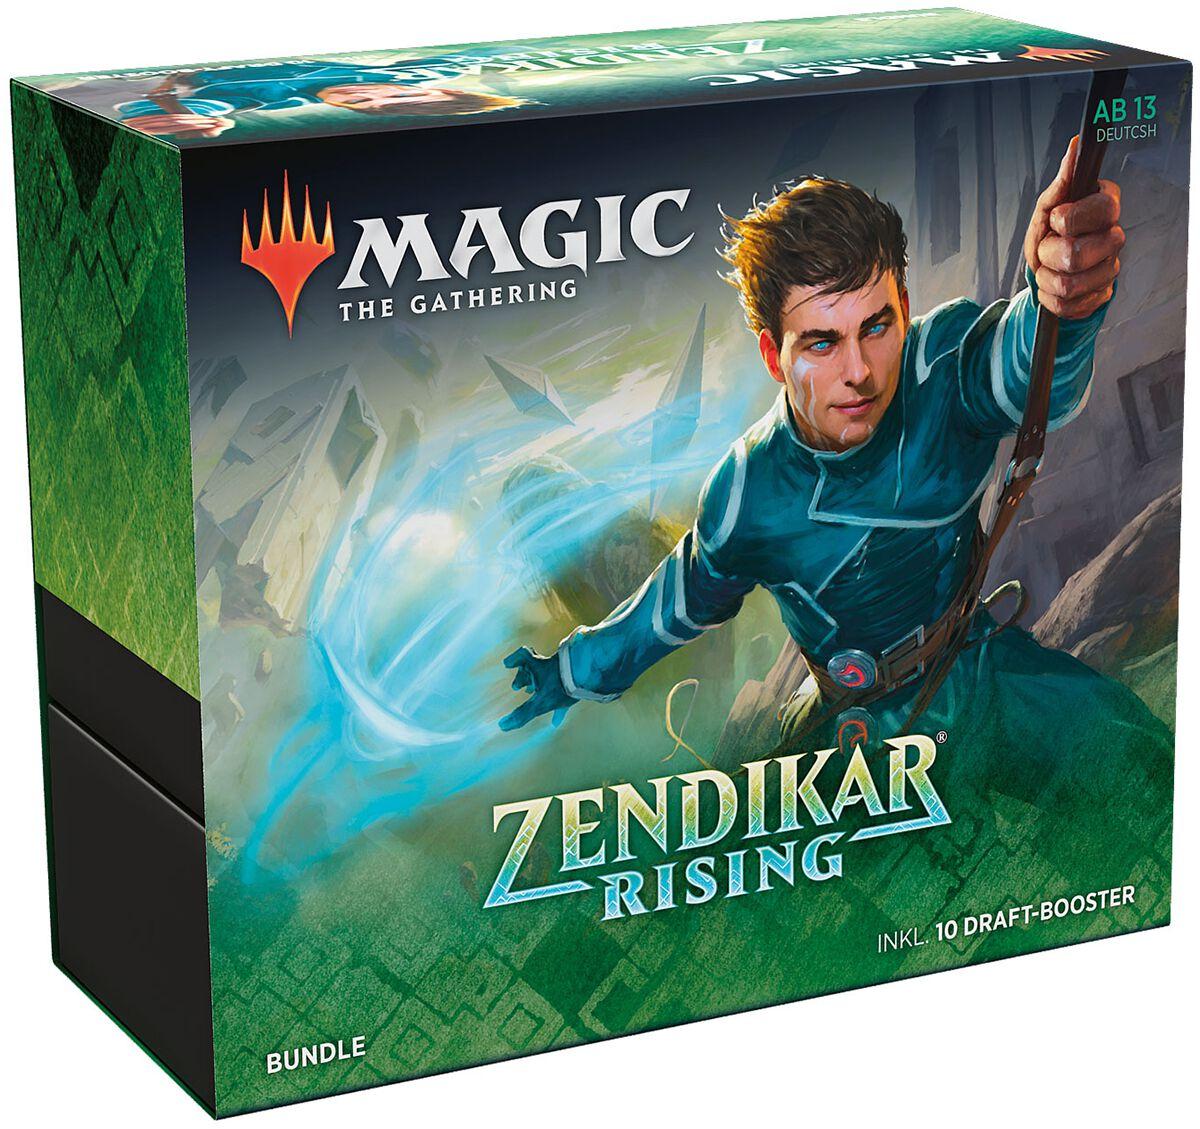 Magic: The Gathering  Zendikar Rising - Bundle deutsch  Kartenspiel  Standard